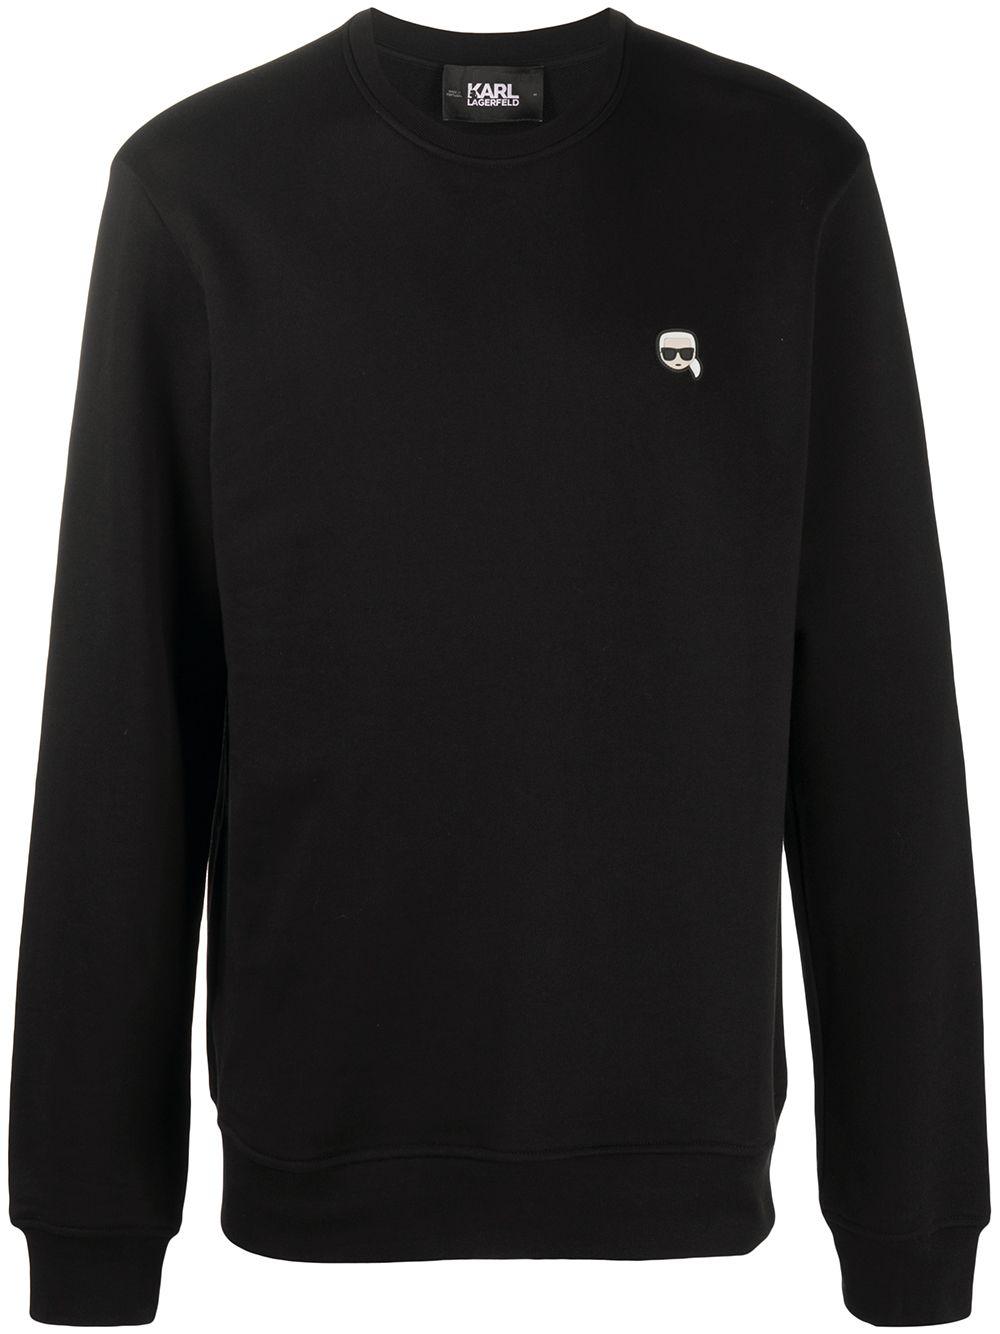 Karl Lagerfeld T-Shirt mit Ikonik-Patch - Schwarz